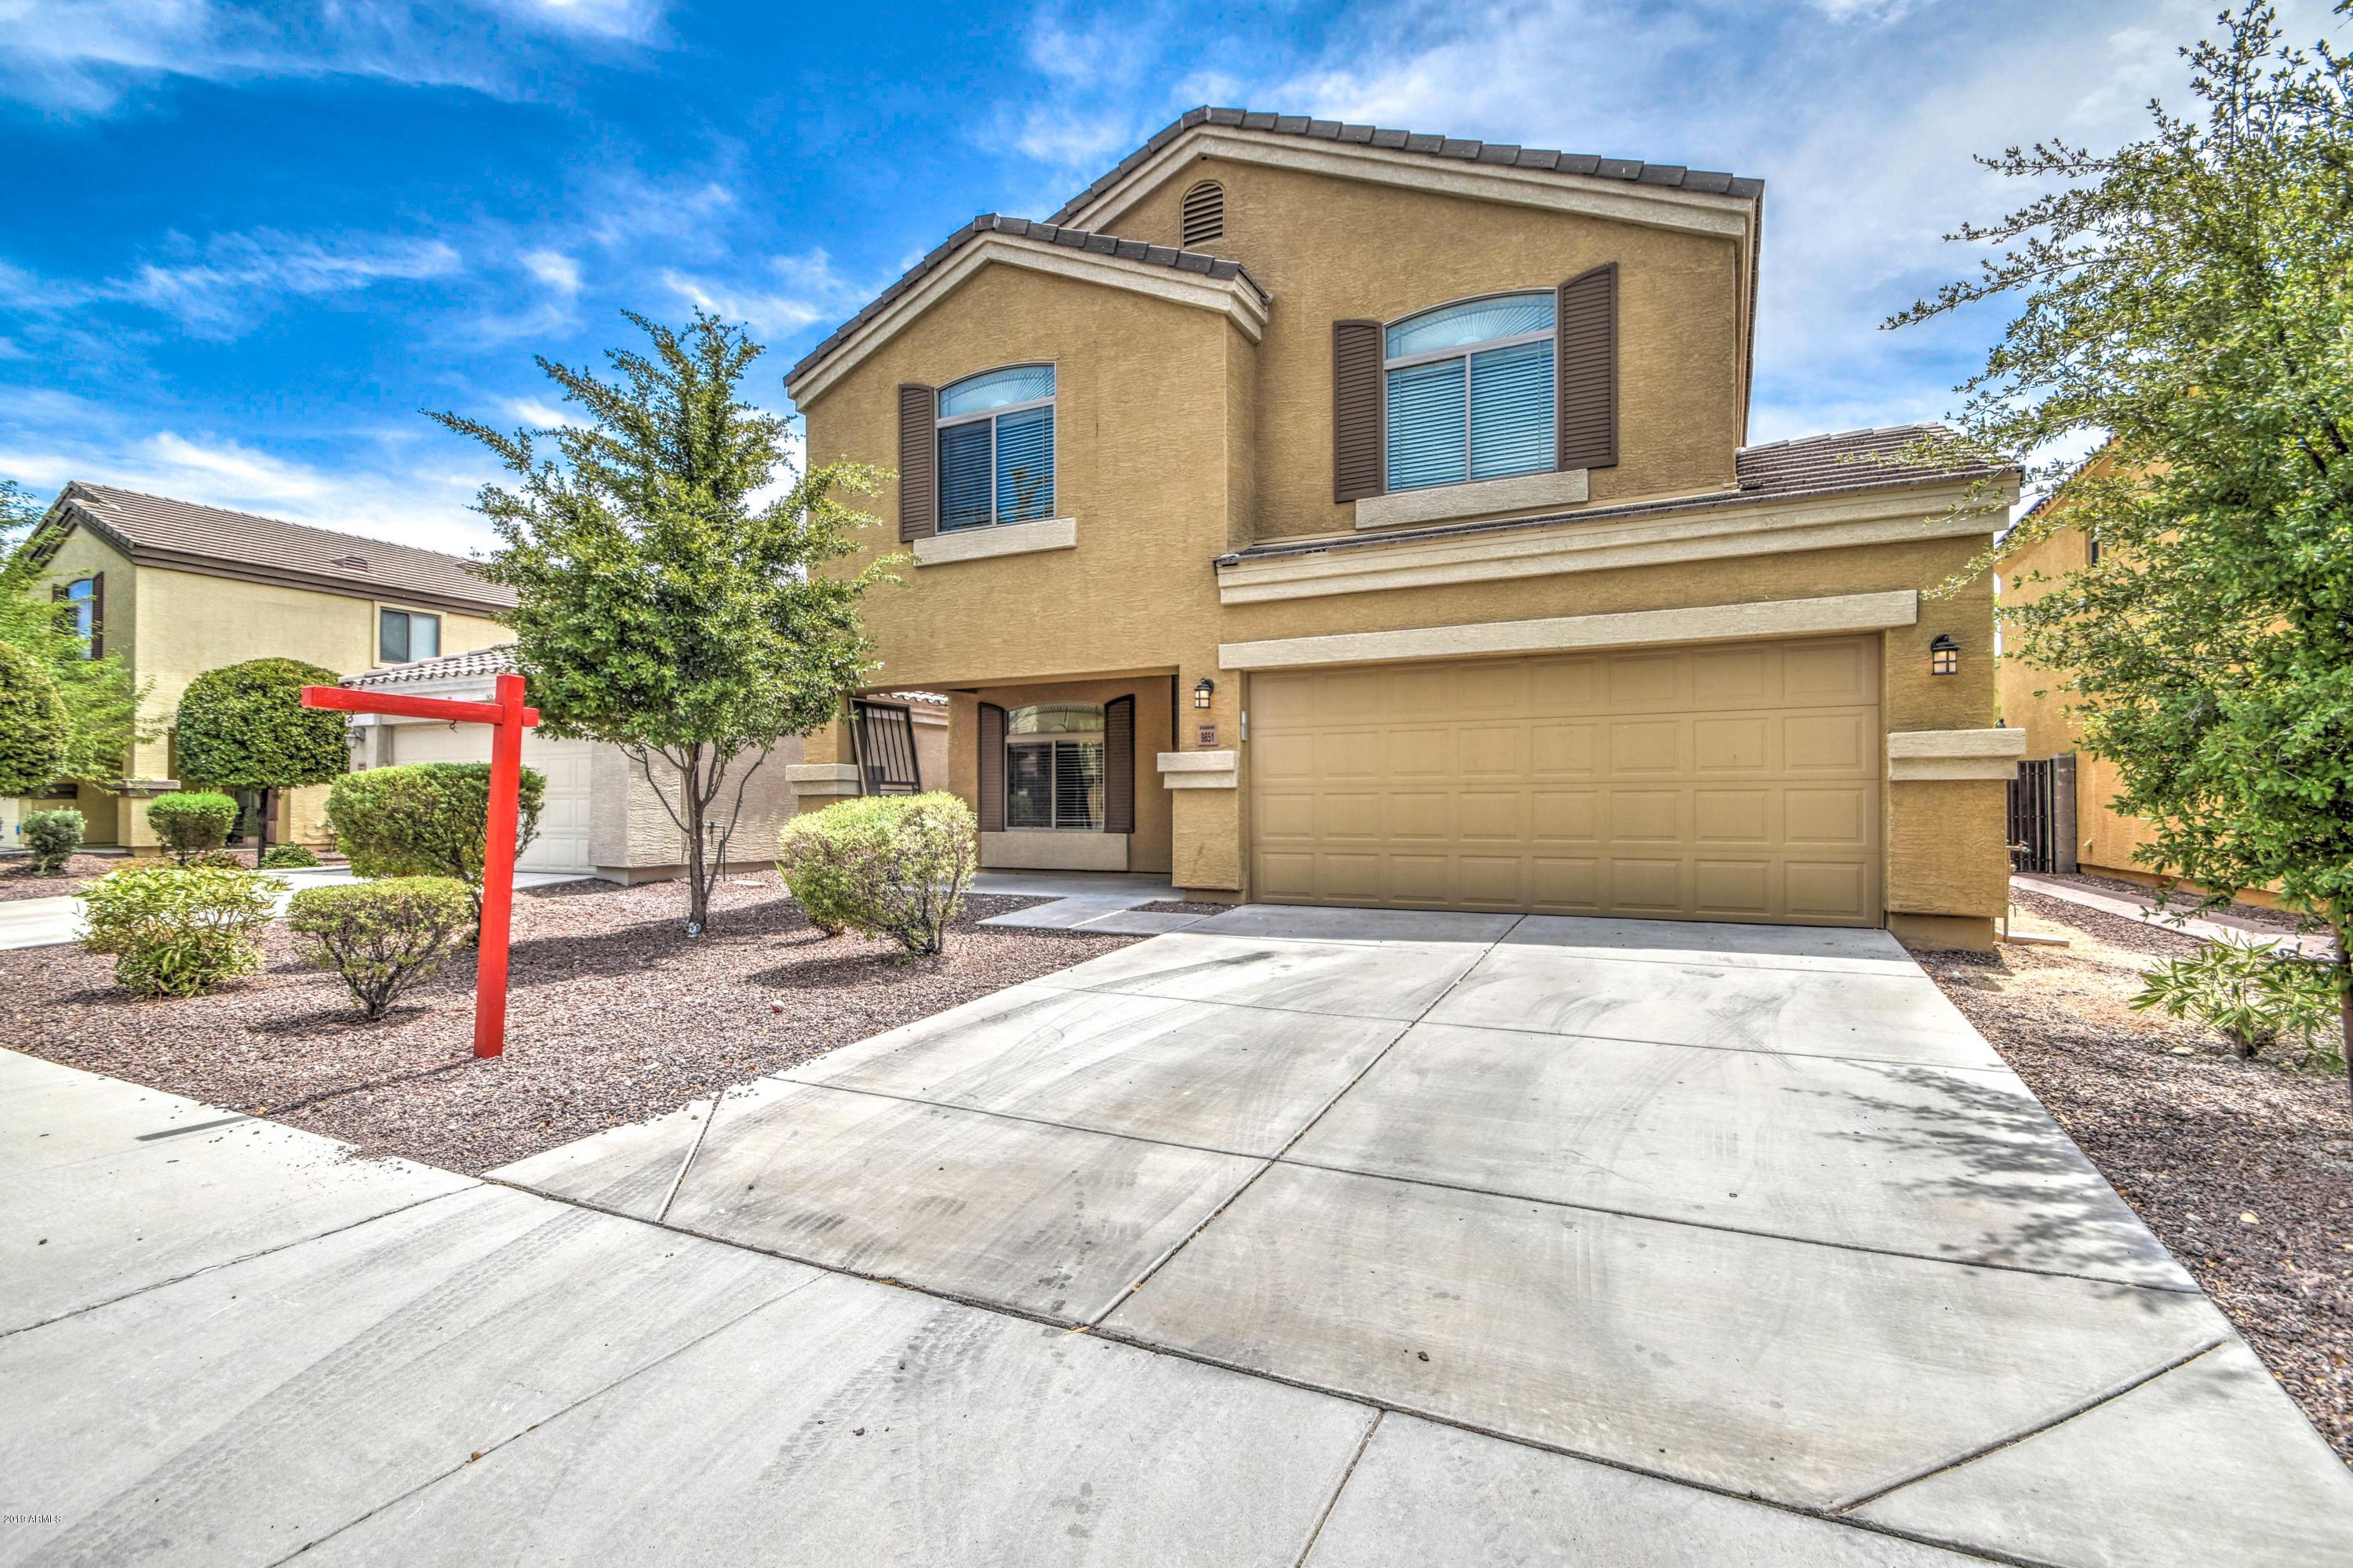 MLS 5960149 9851 W LONE CACTUS Drive, Peoria, AZ 85382 Peoria AZ Camino A Lago